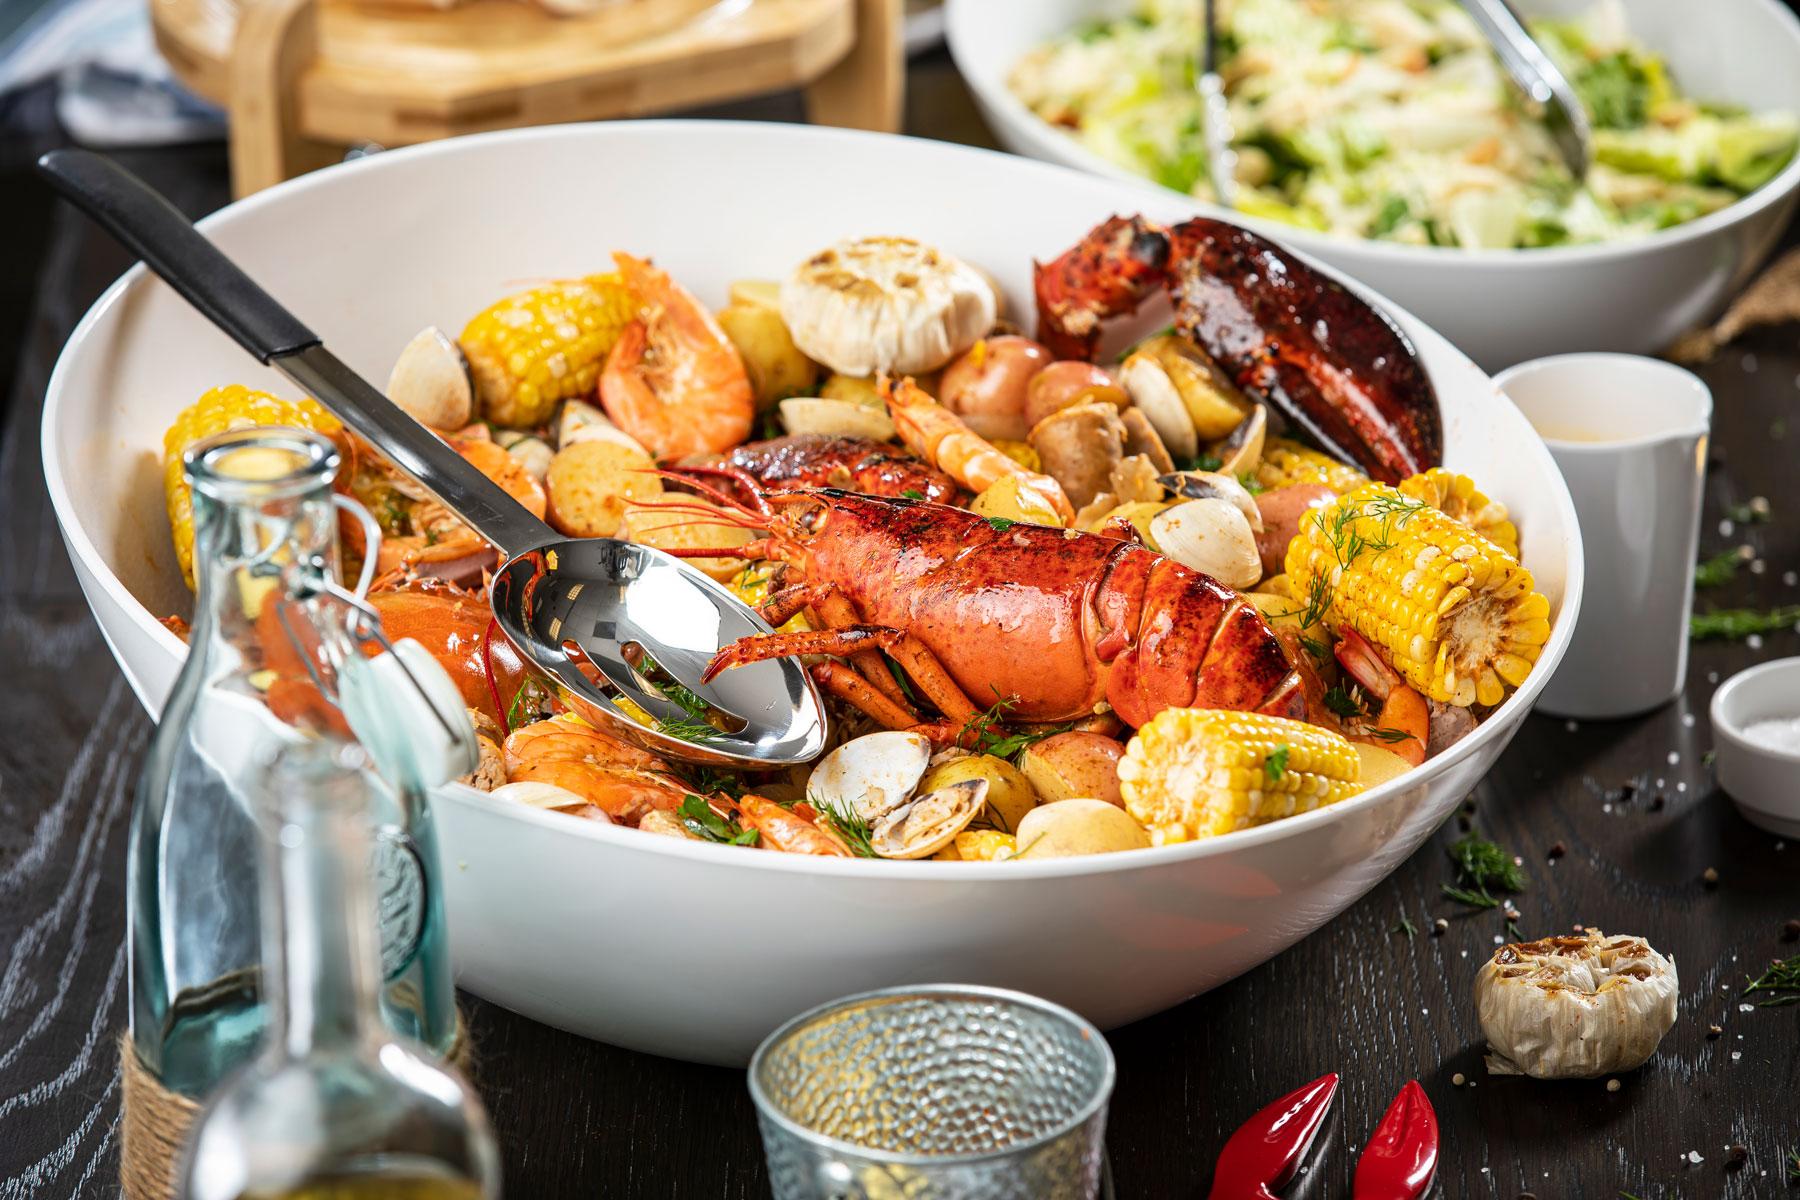 Hosting a Simple Lobster Bake